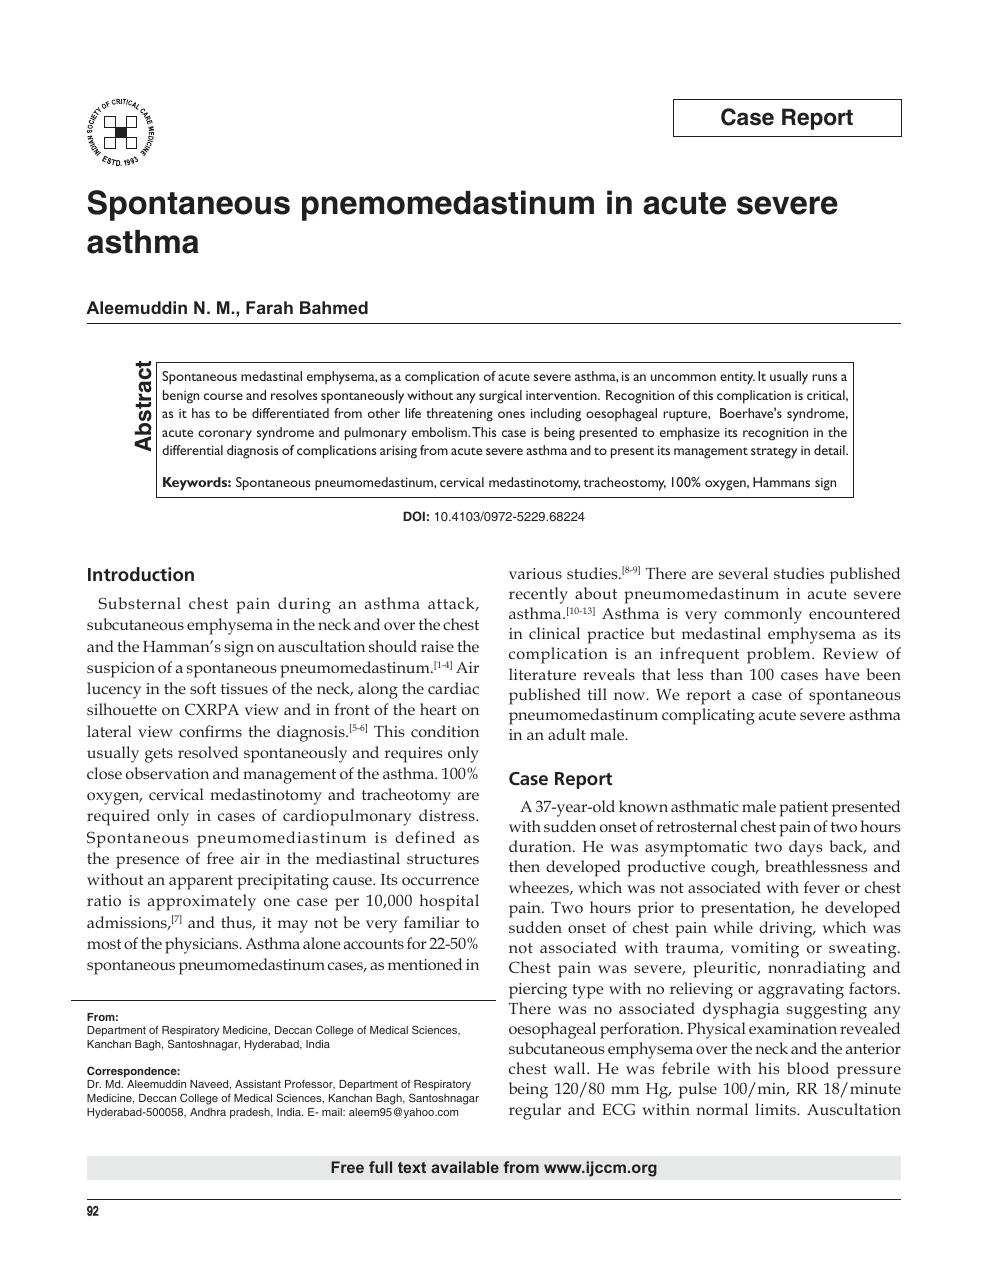 Spontaneous pnemomedastinum in acute severe asthma – topic